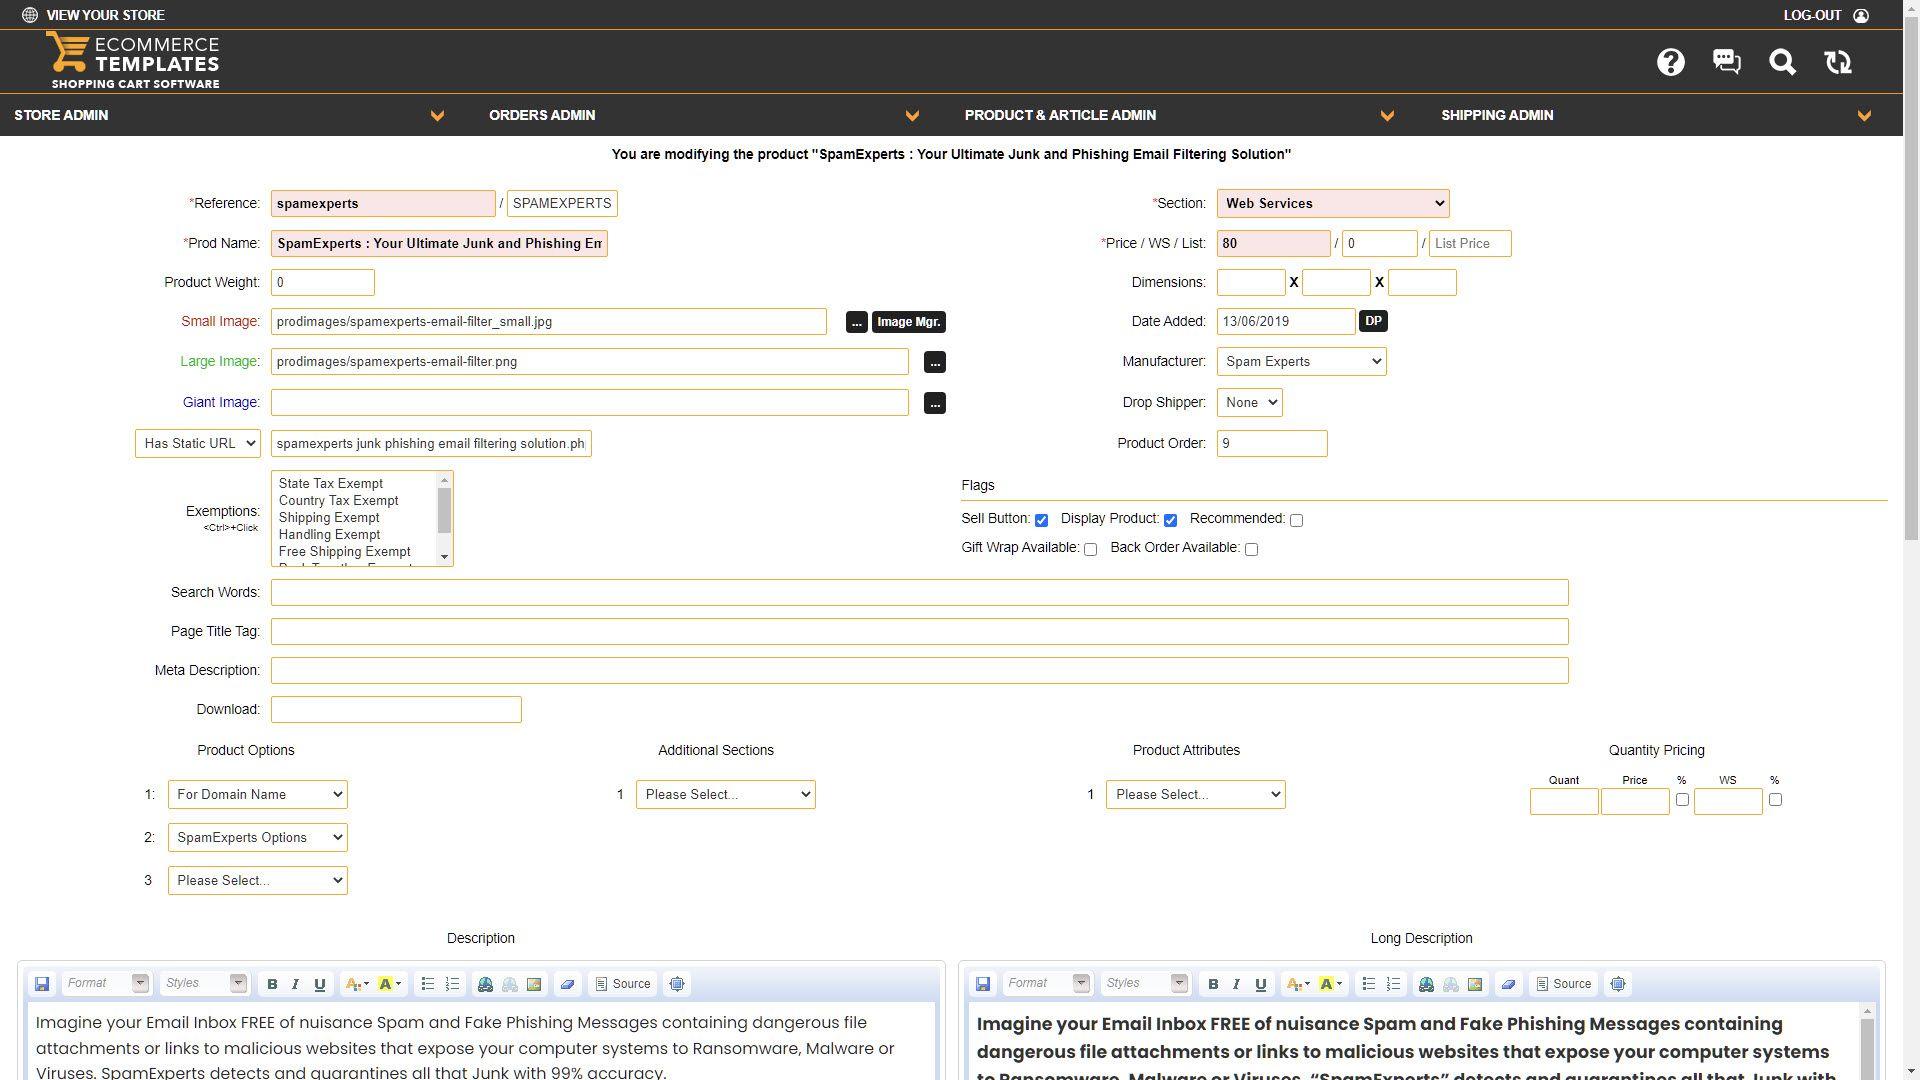 Ecommerce templates admin panel custom css stylesheet for Responsive stylesheet template